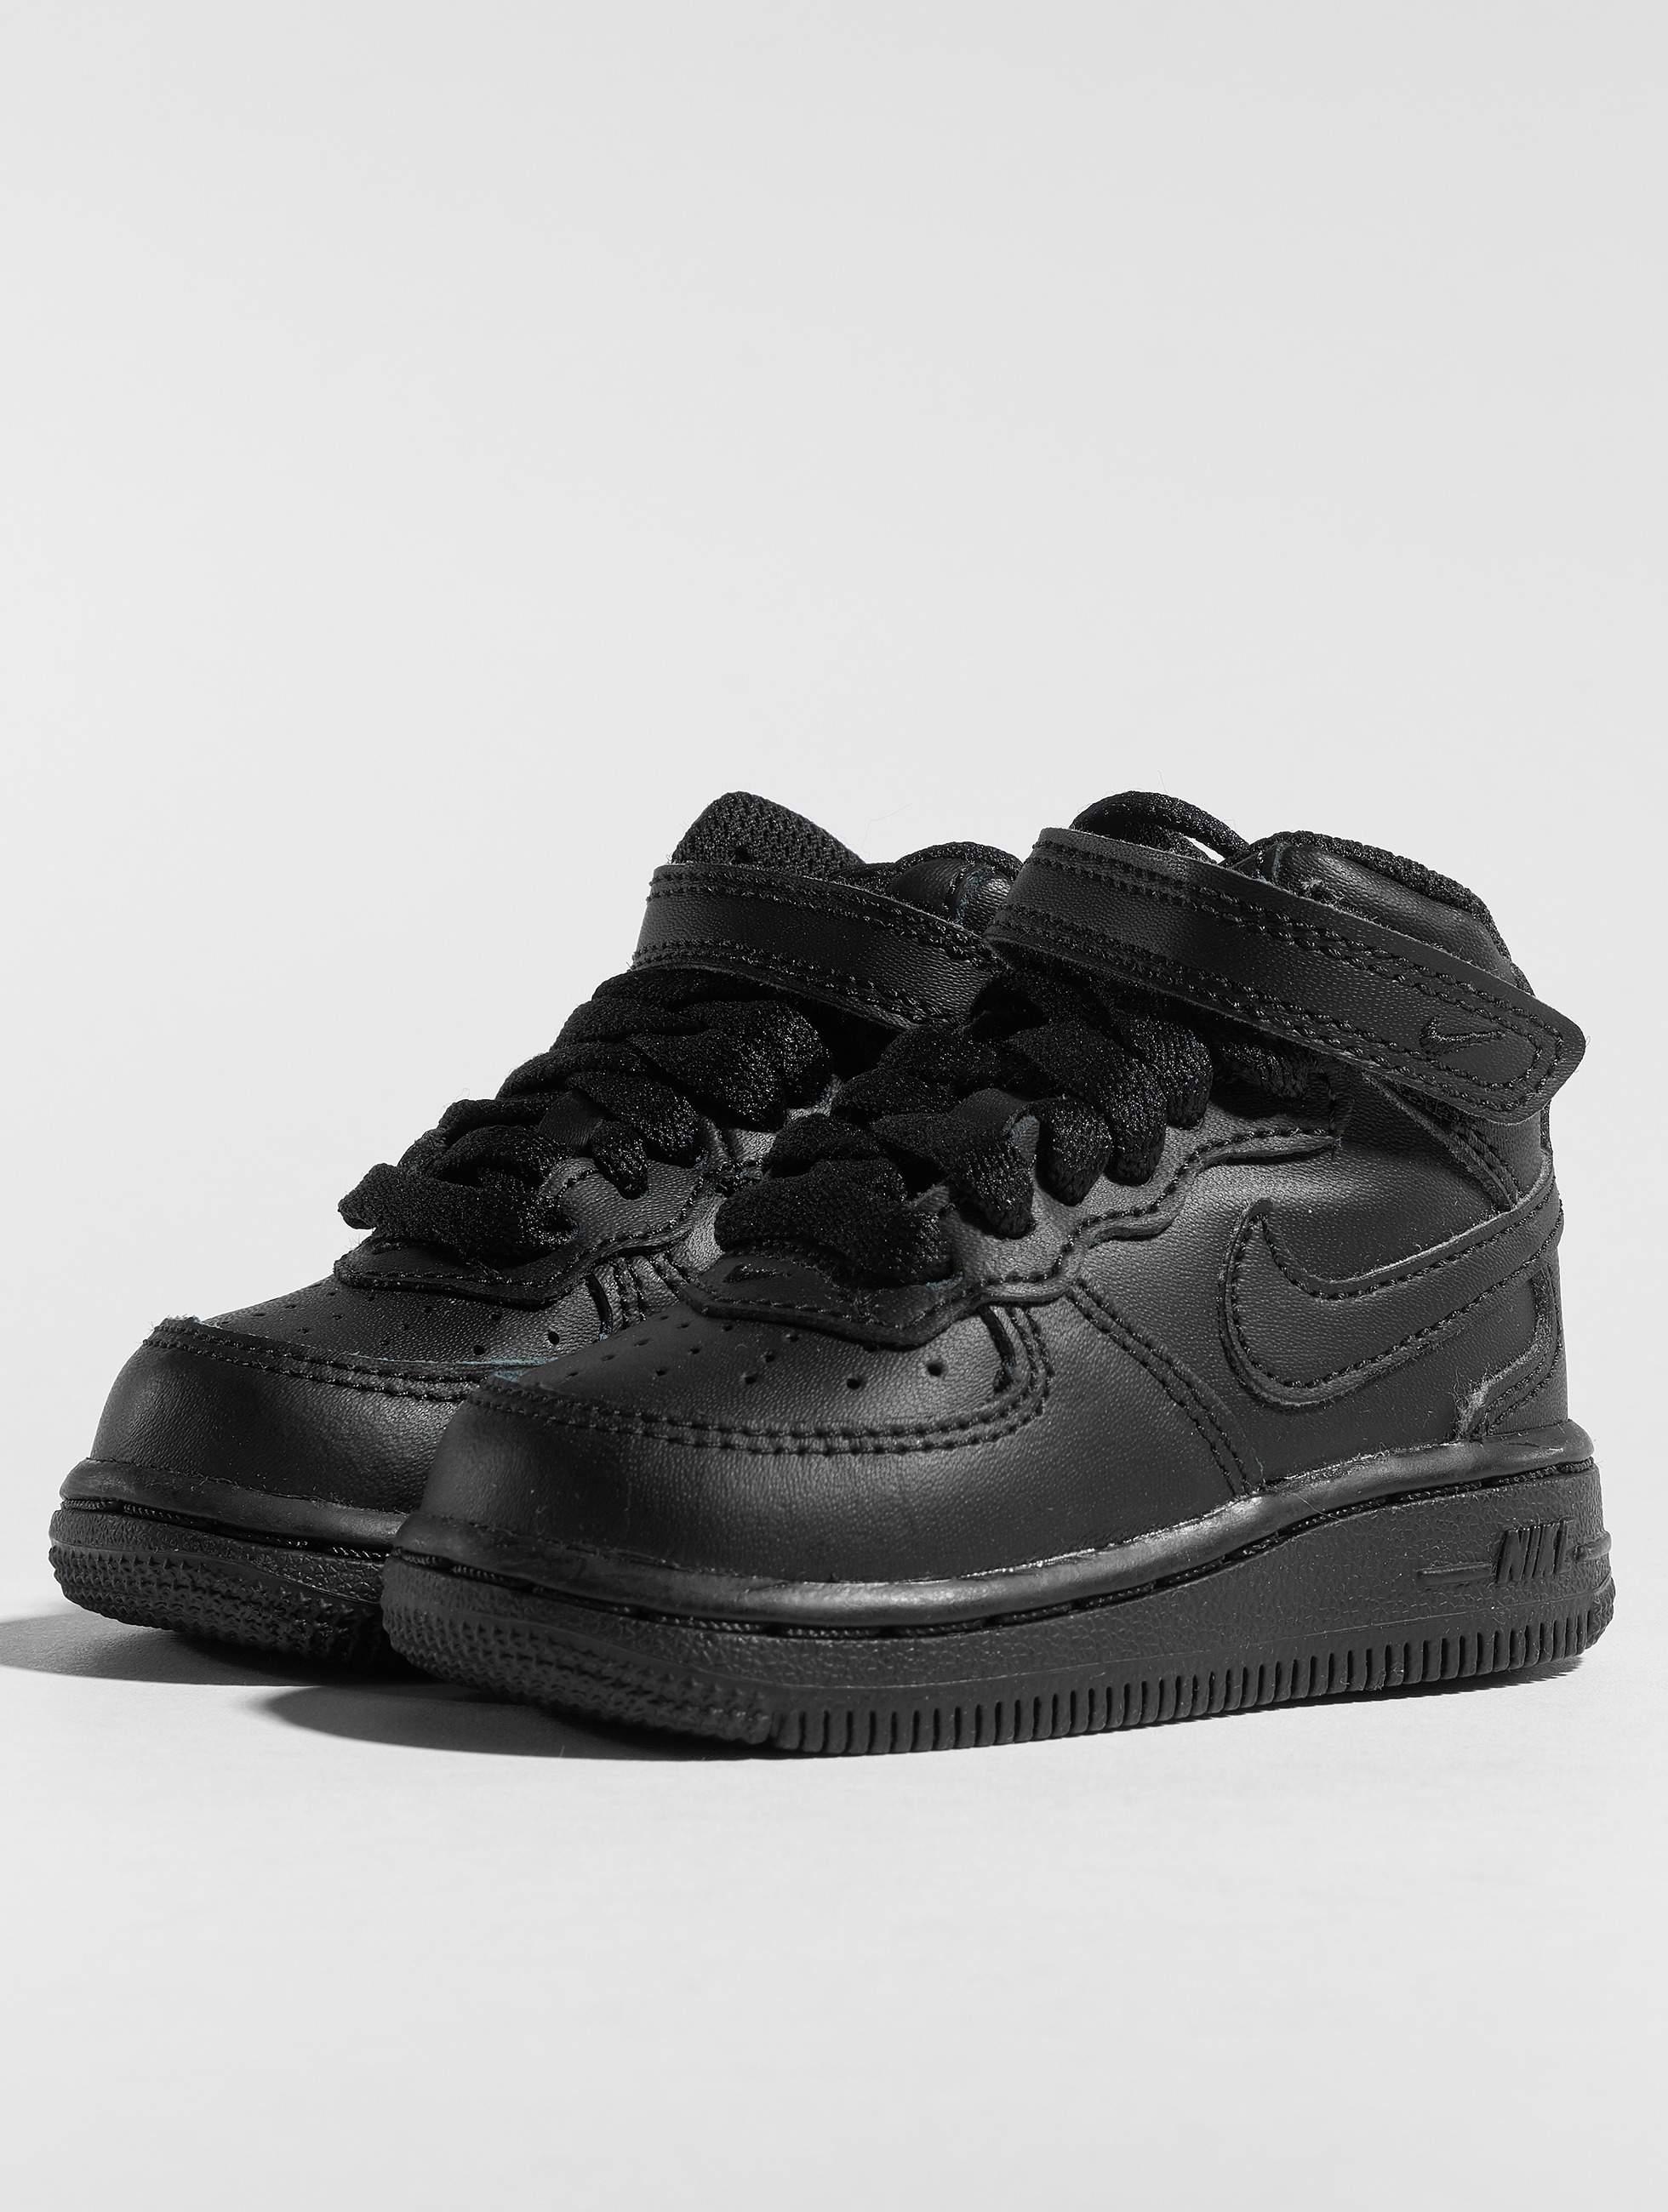 no sale tax fantastic savings better Nike Air Force 1 Mid TD Sneakers Black/Black